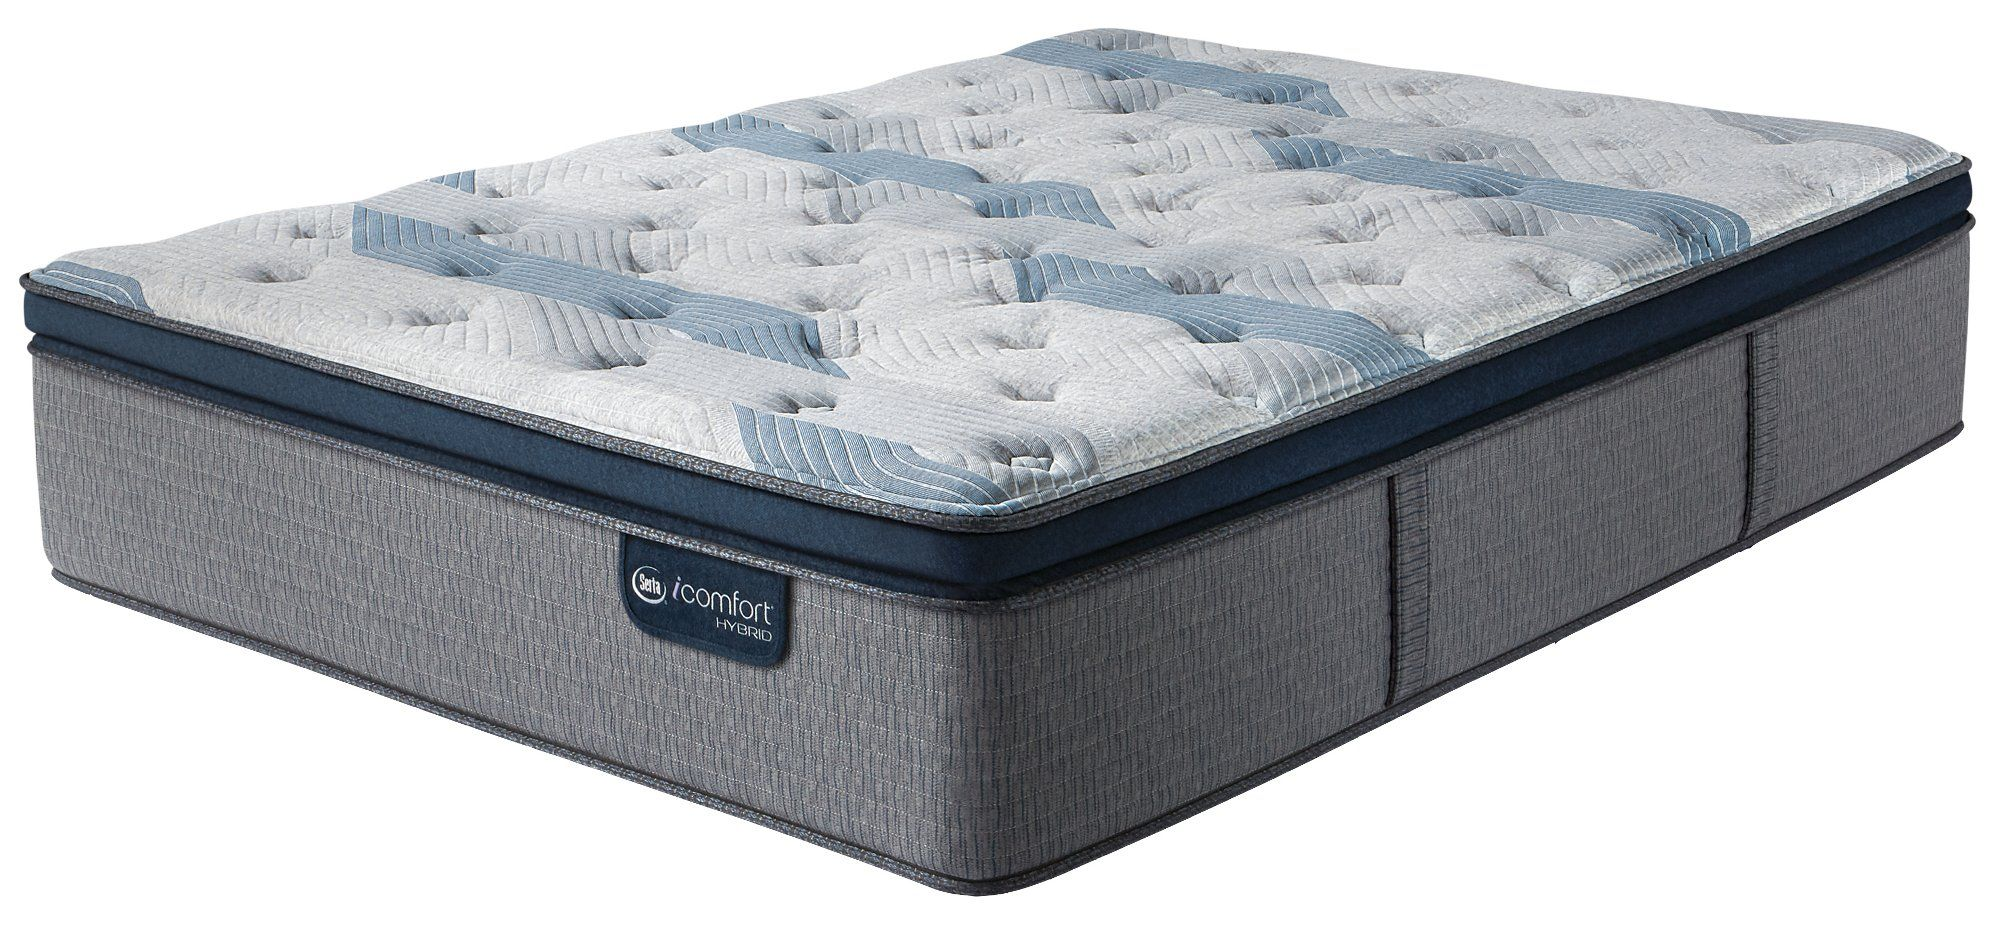 Serta 300 Pillow Top Split California King Mattress Blue